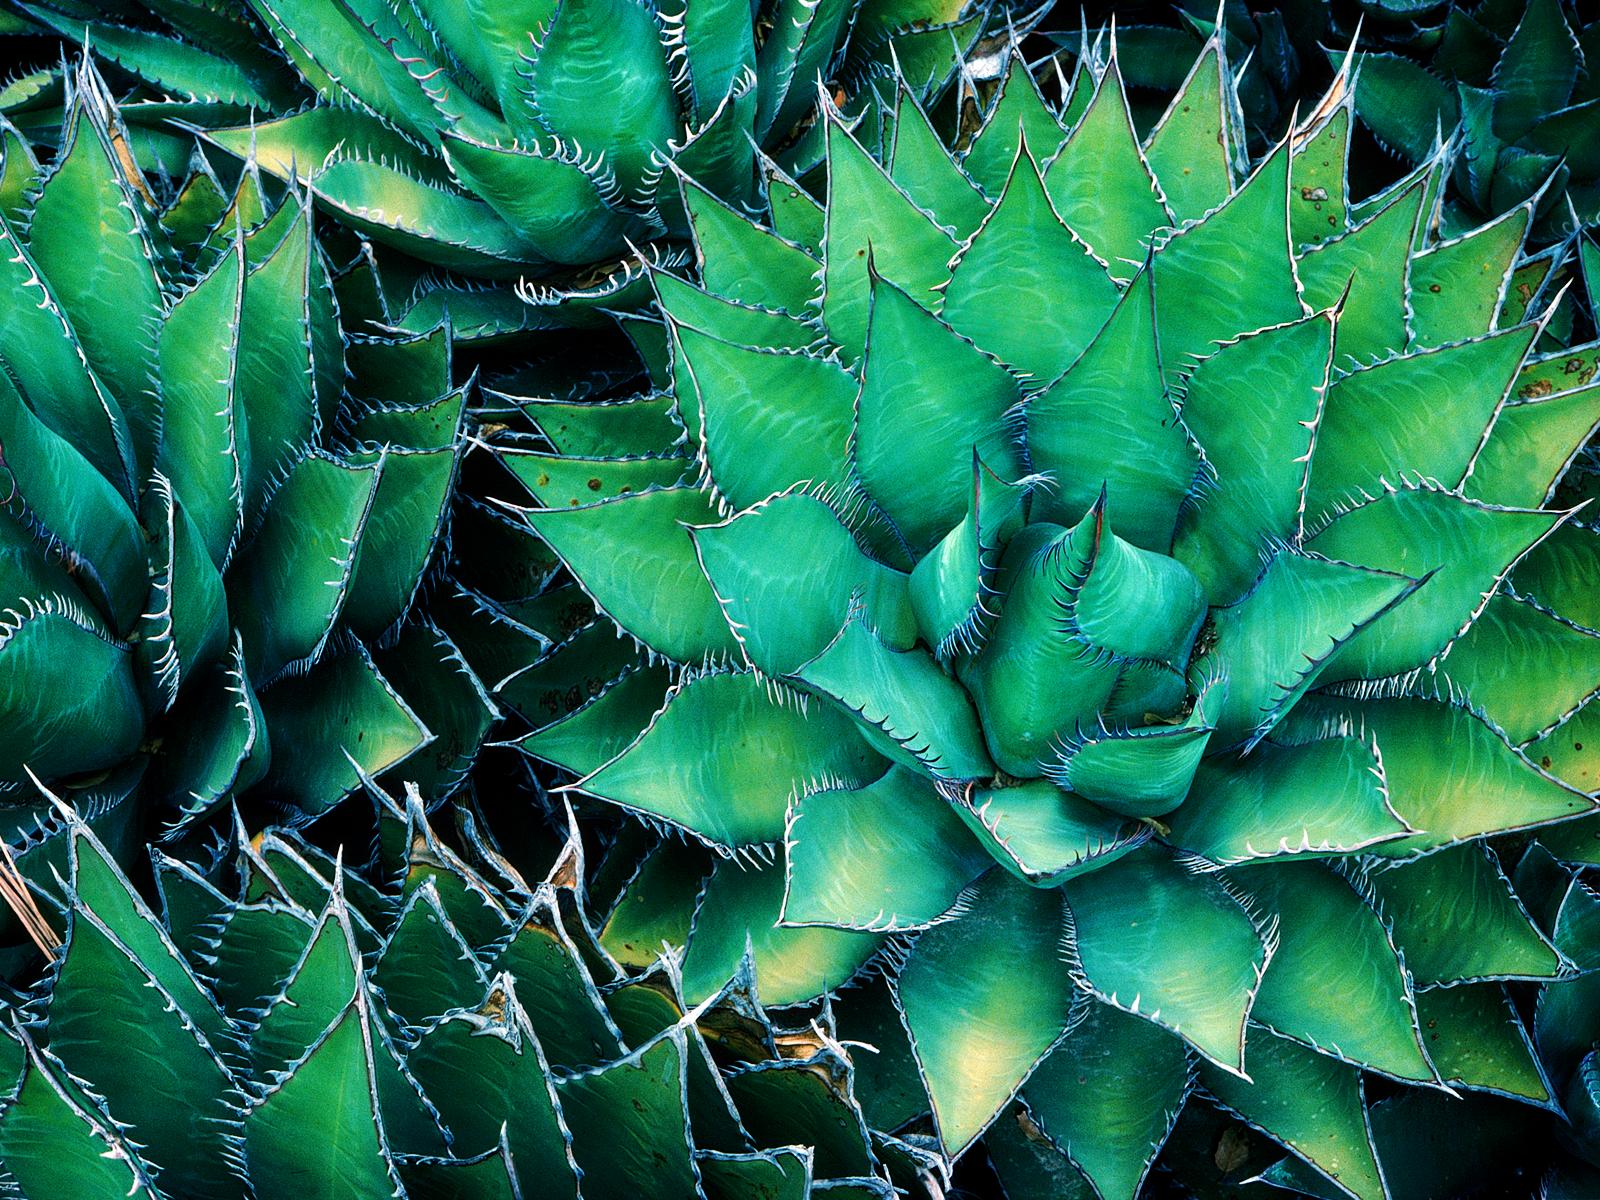 pineapple cactus wallpaper. Some short takes: